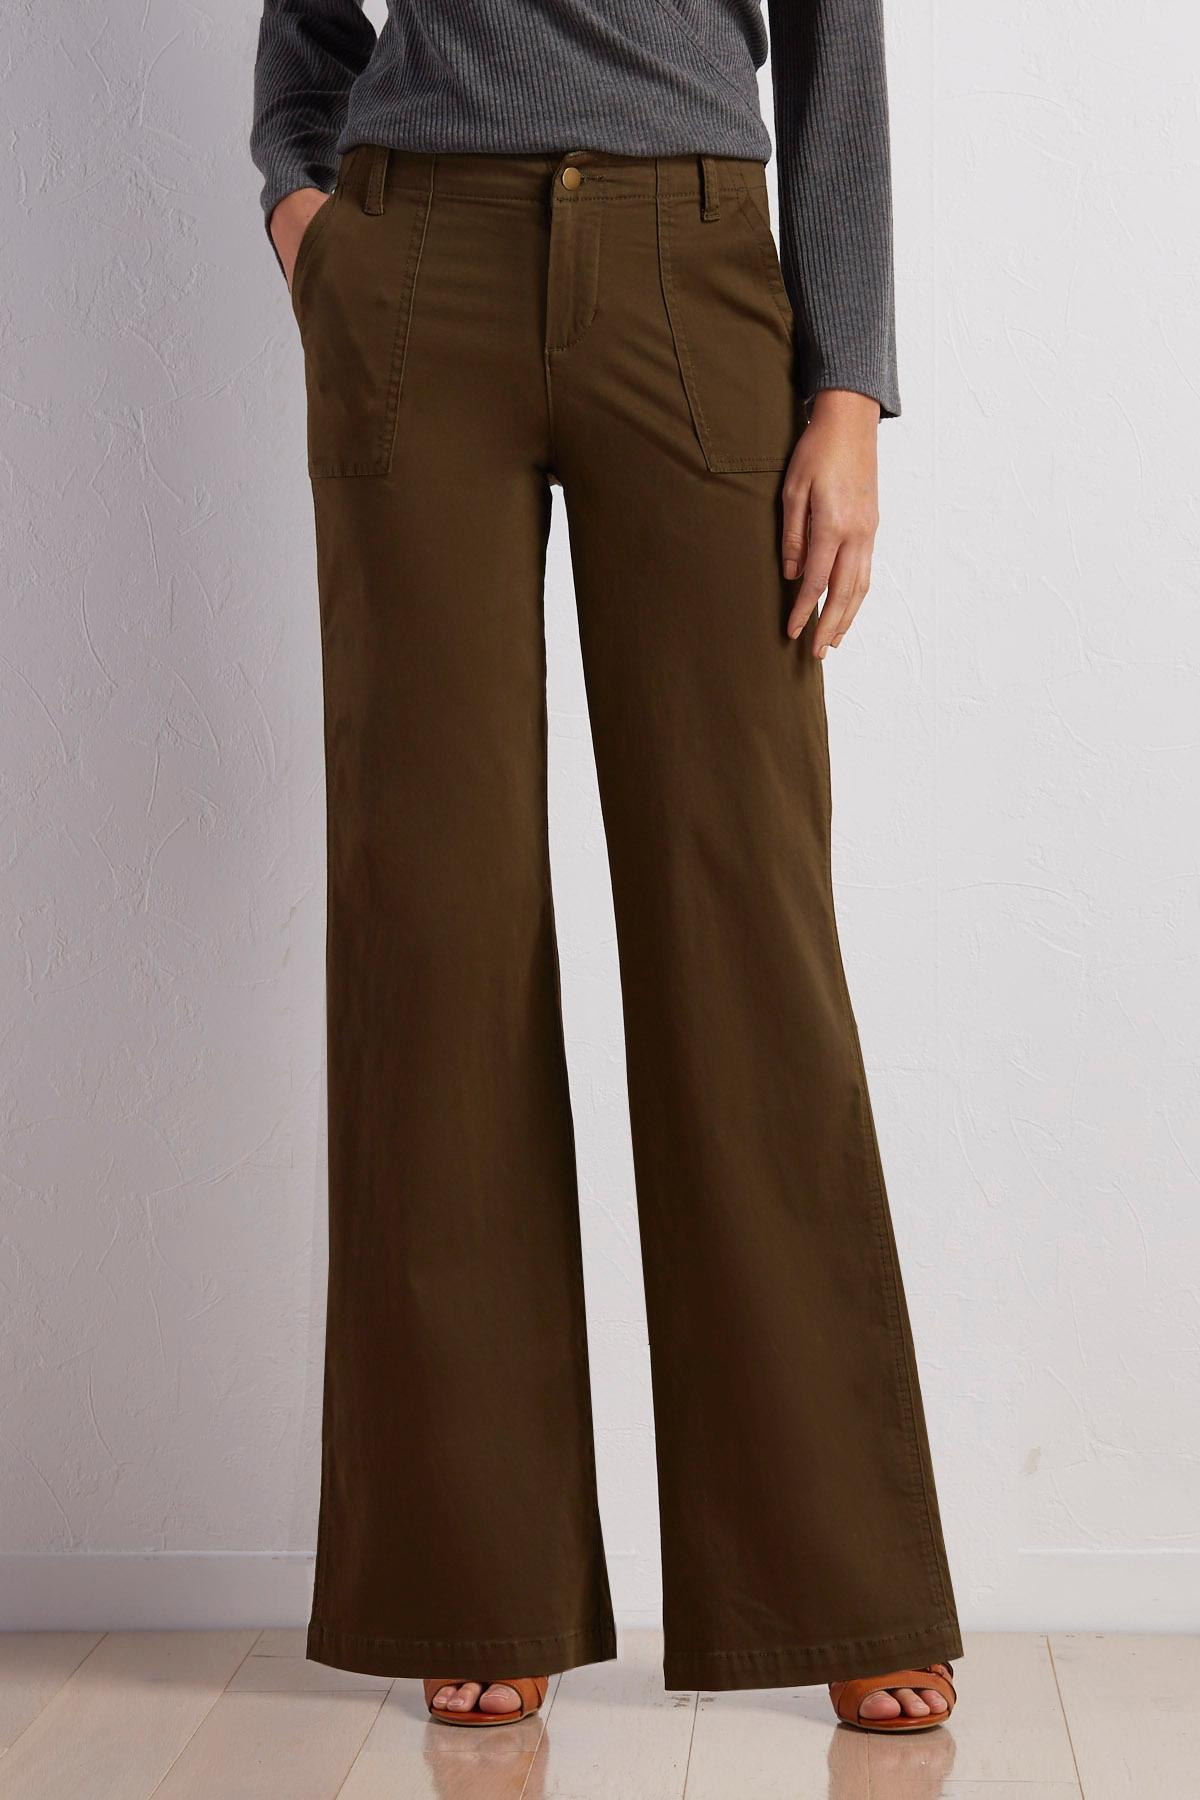 Patch Pocket Wide Leg Pants